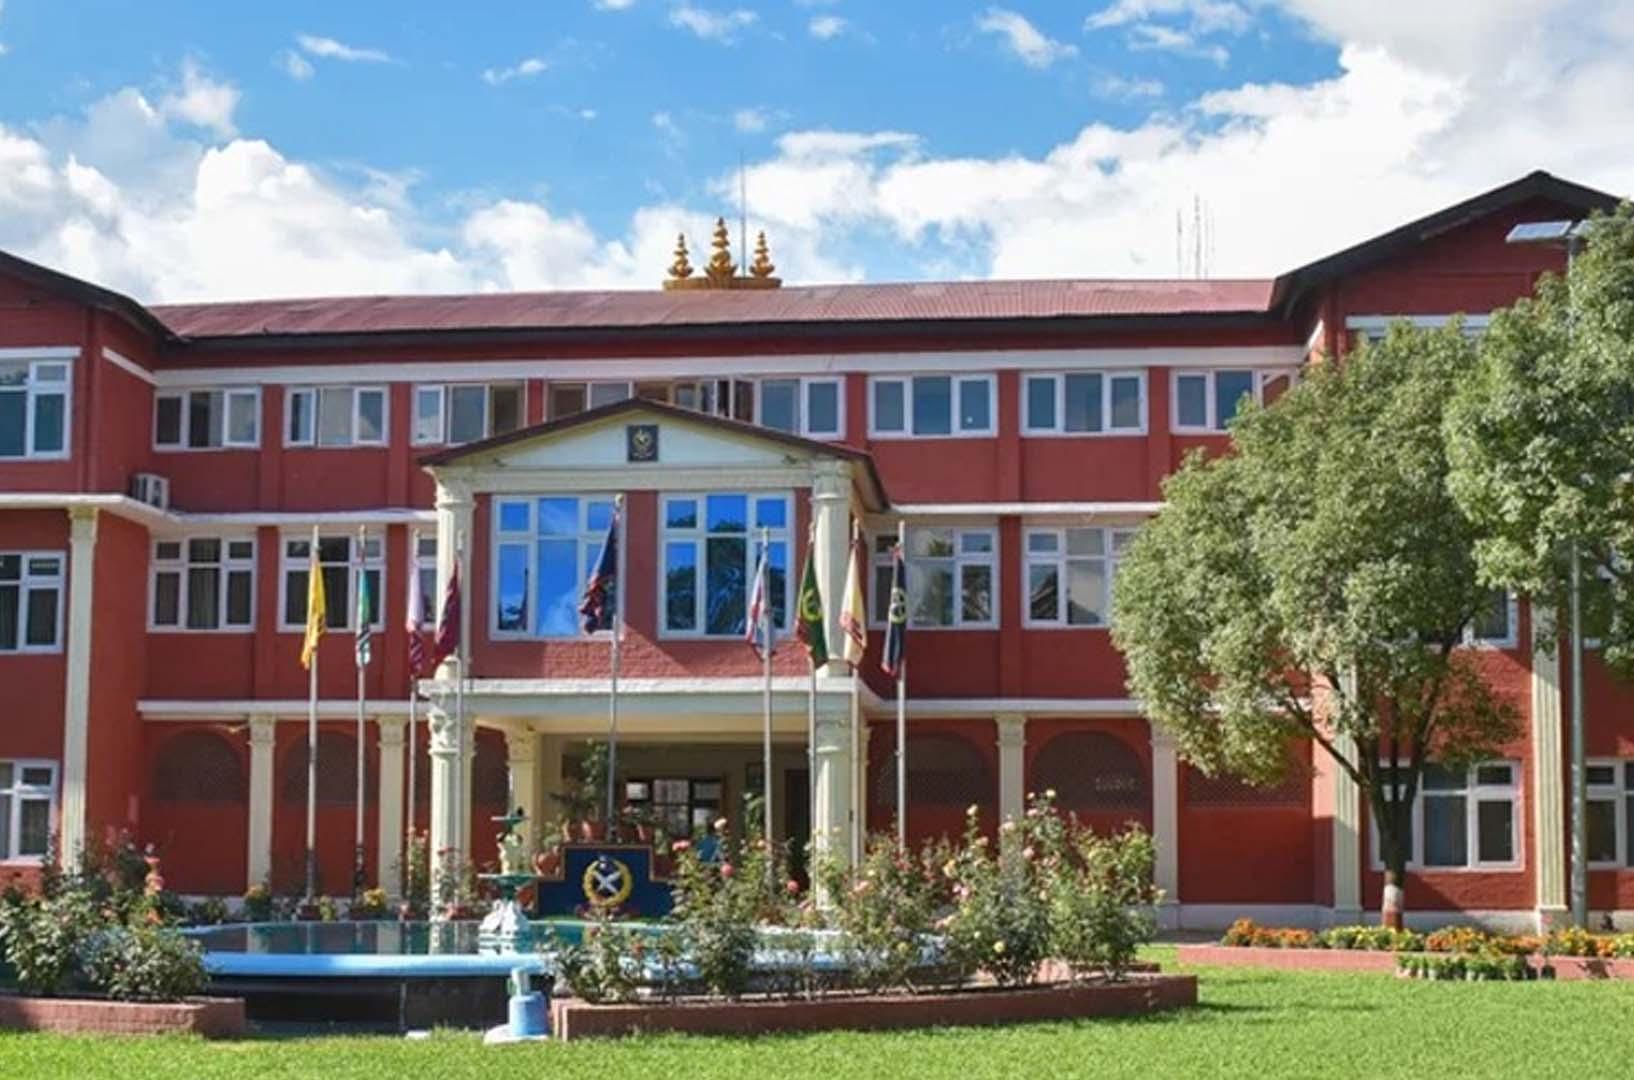 नेपाल प्रहरीमा खुल्यो ठुलो संख्यामा रोजगारी (सूचनासहित)